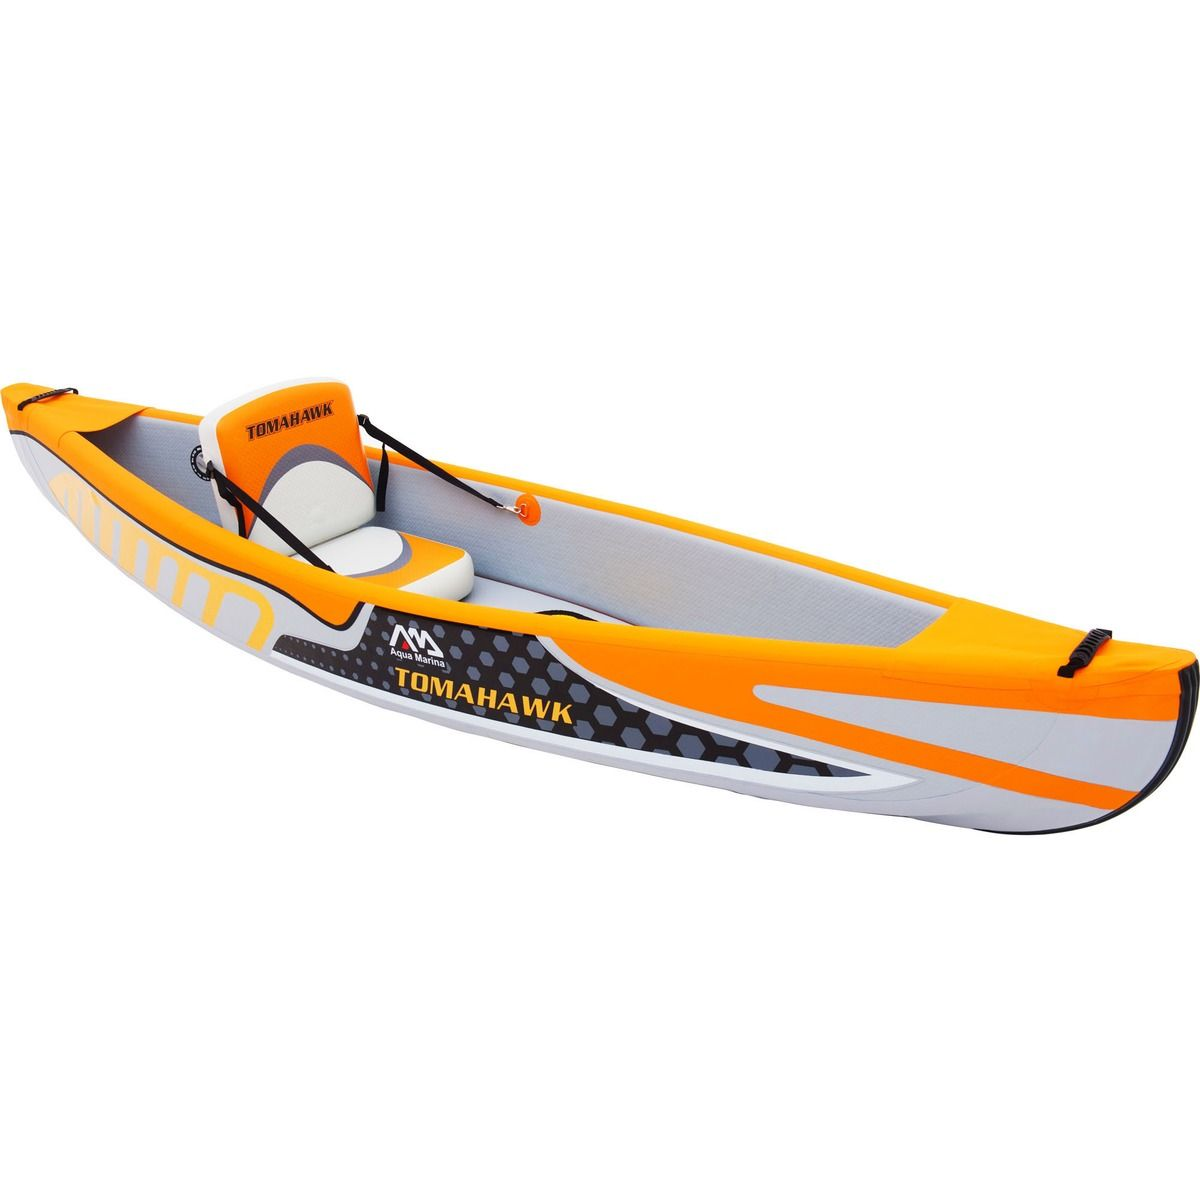 Aqua Marina Tomahawk 1p, kajakk Kajakk | XXL | Kajakk, Aqua